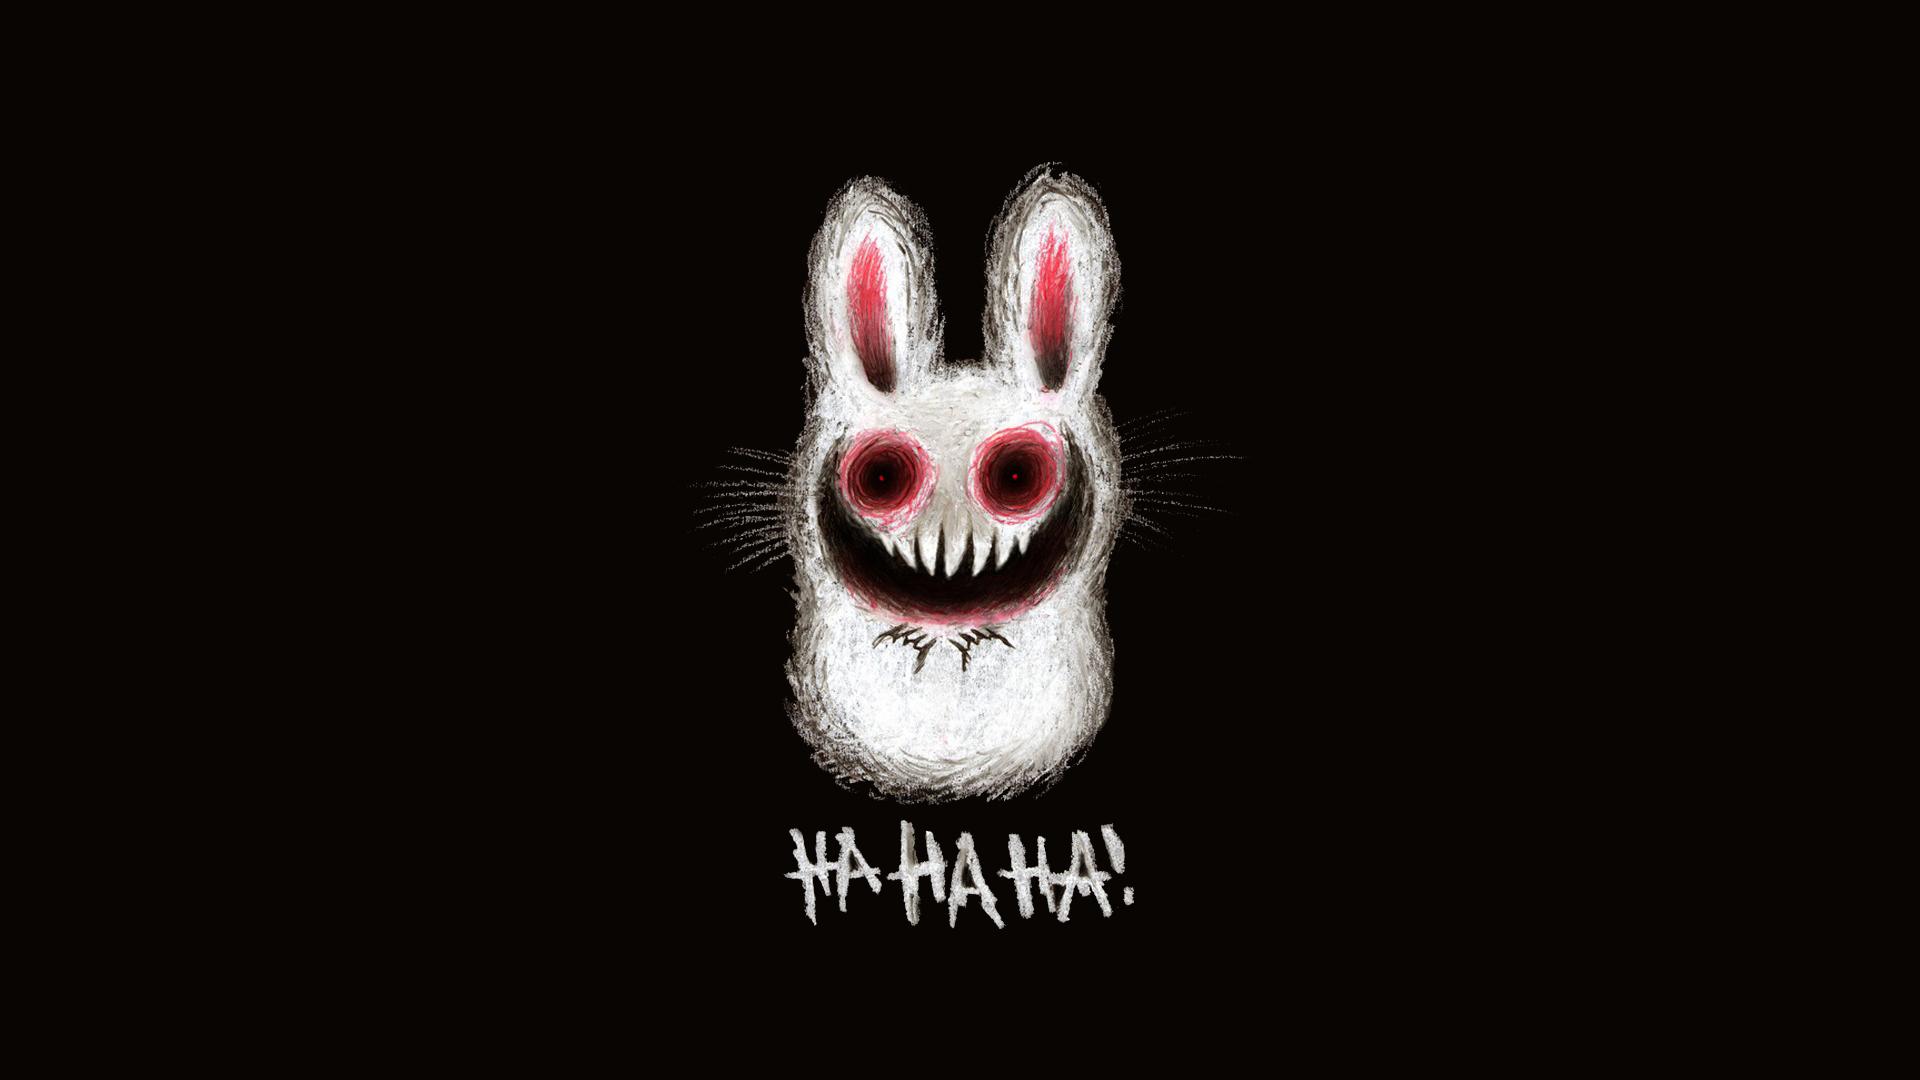 черно-белый кролик онлайн